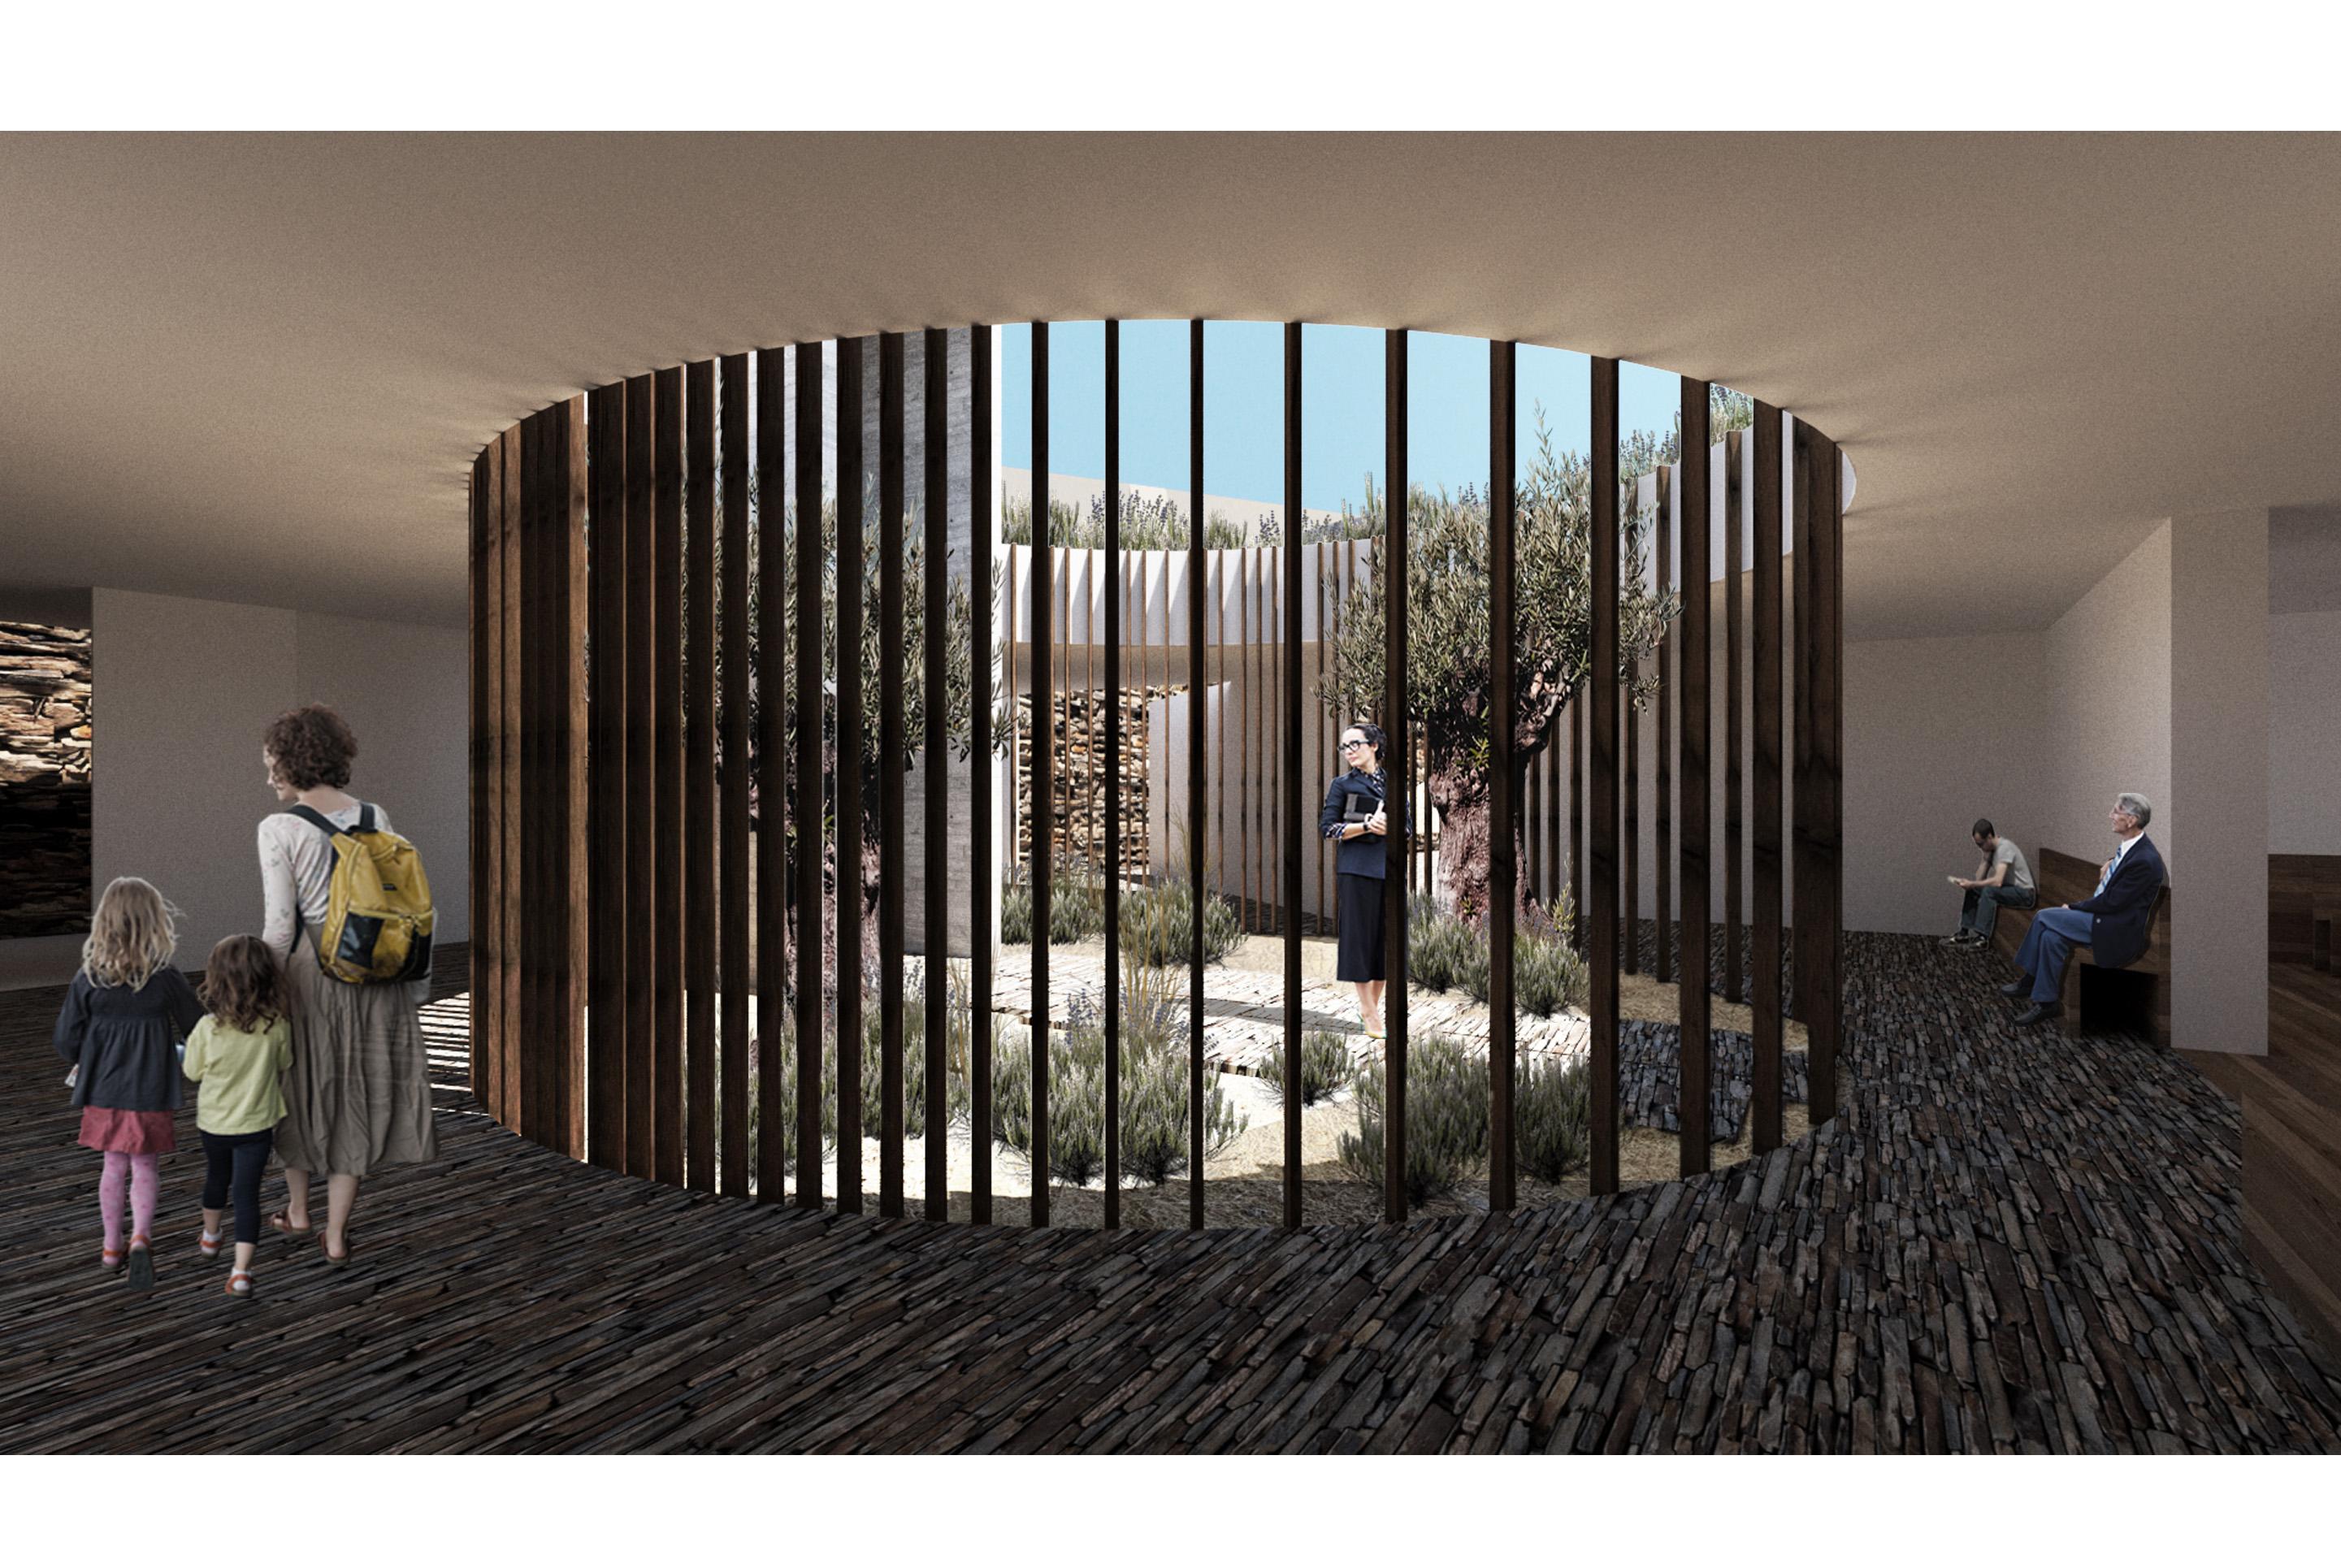 Casa mortuaria mortuary barrancos beja alentejo arquitectura architecture funebre arquitecto arquitectos concurso competition